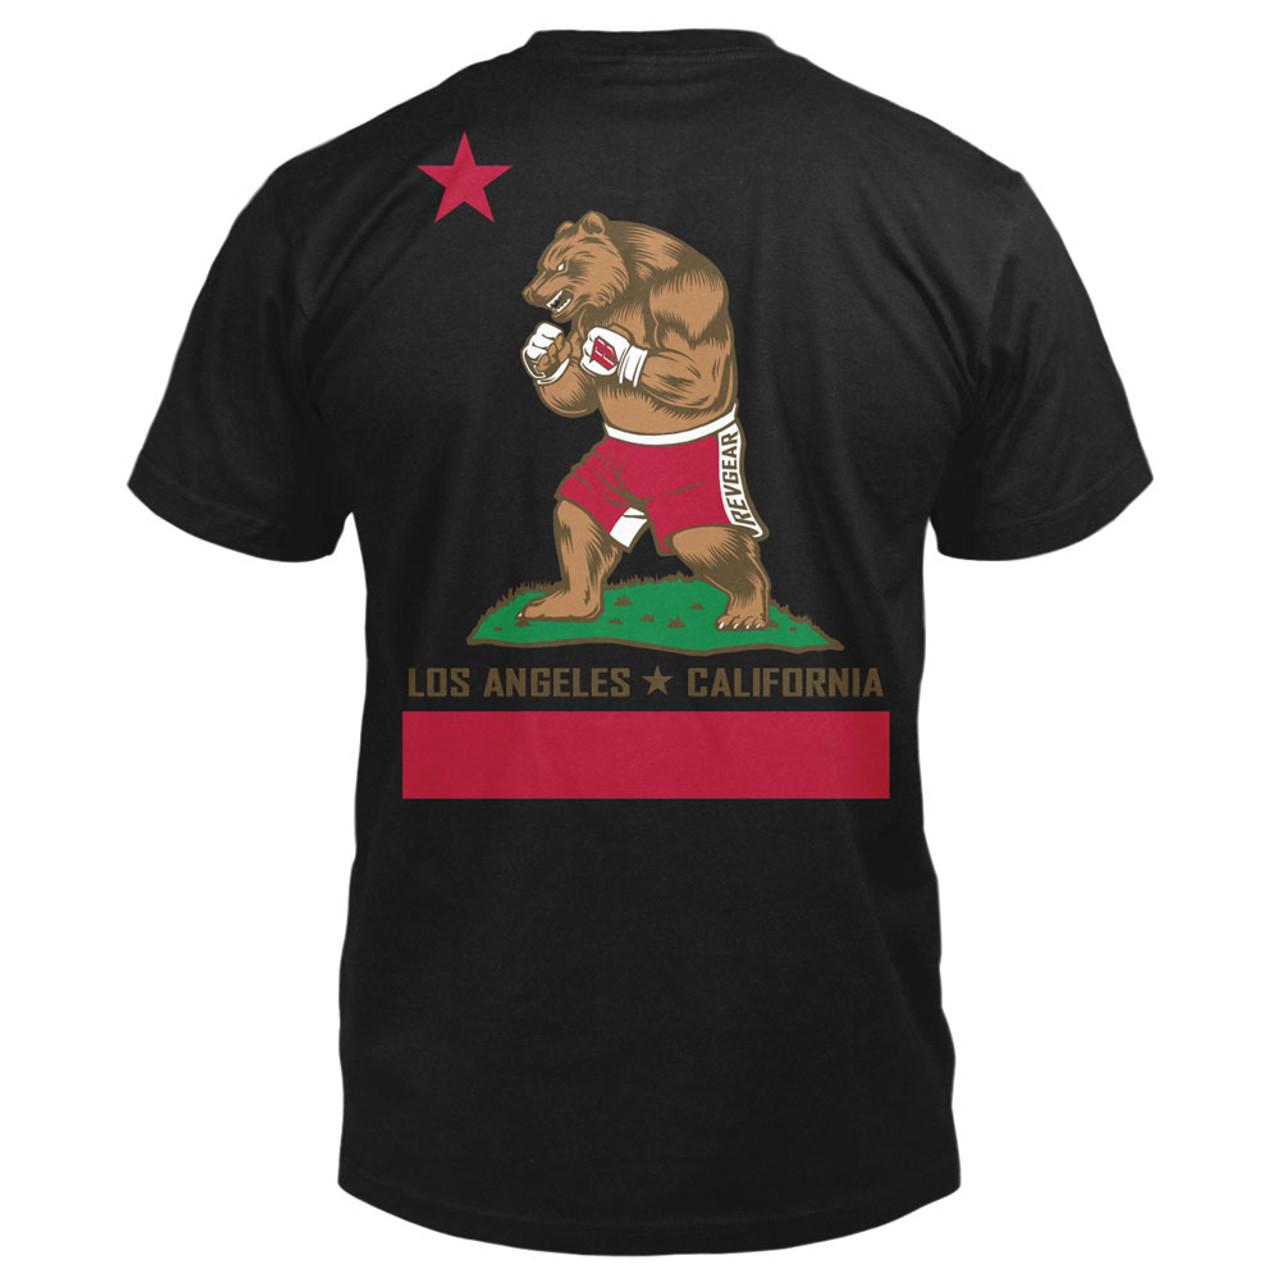 Revgear Cali Premium T-shirt